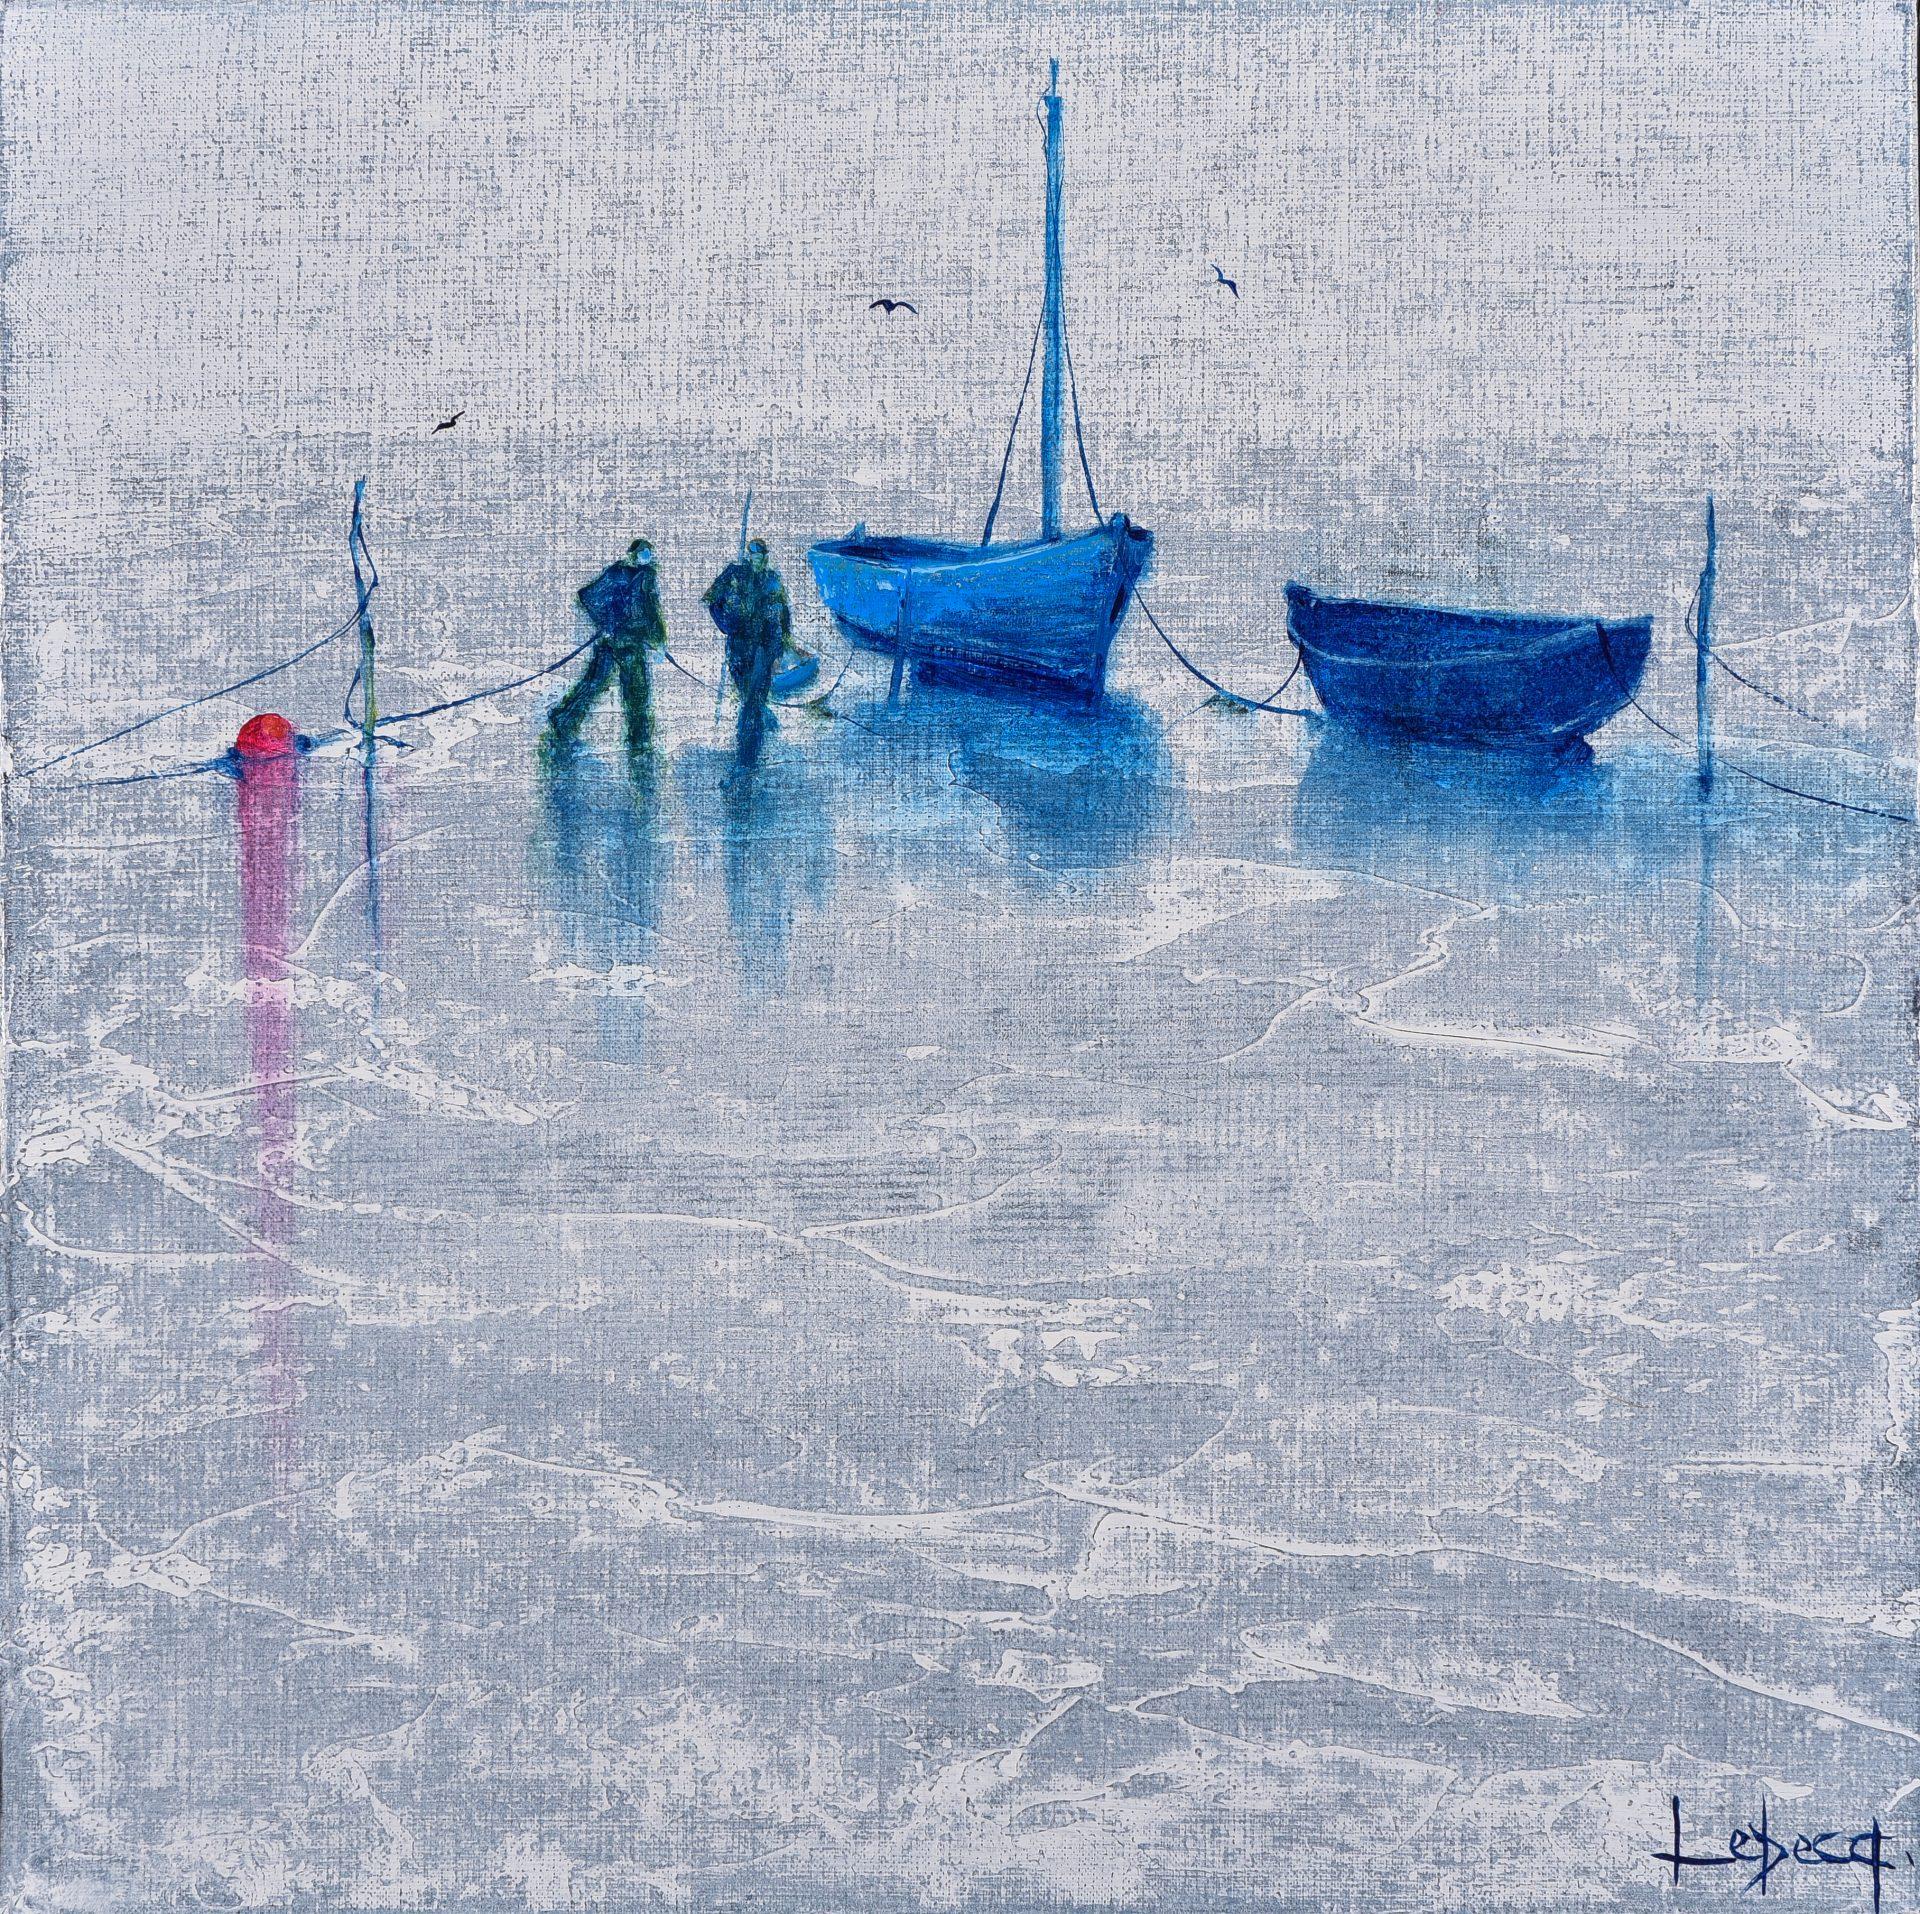 Denis Lebecq artiste peintre pontaven gris